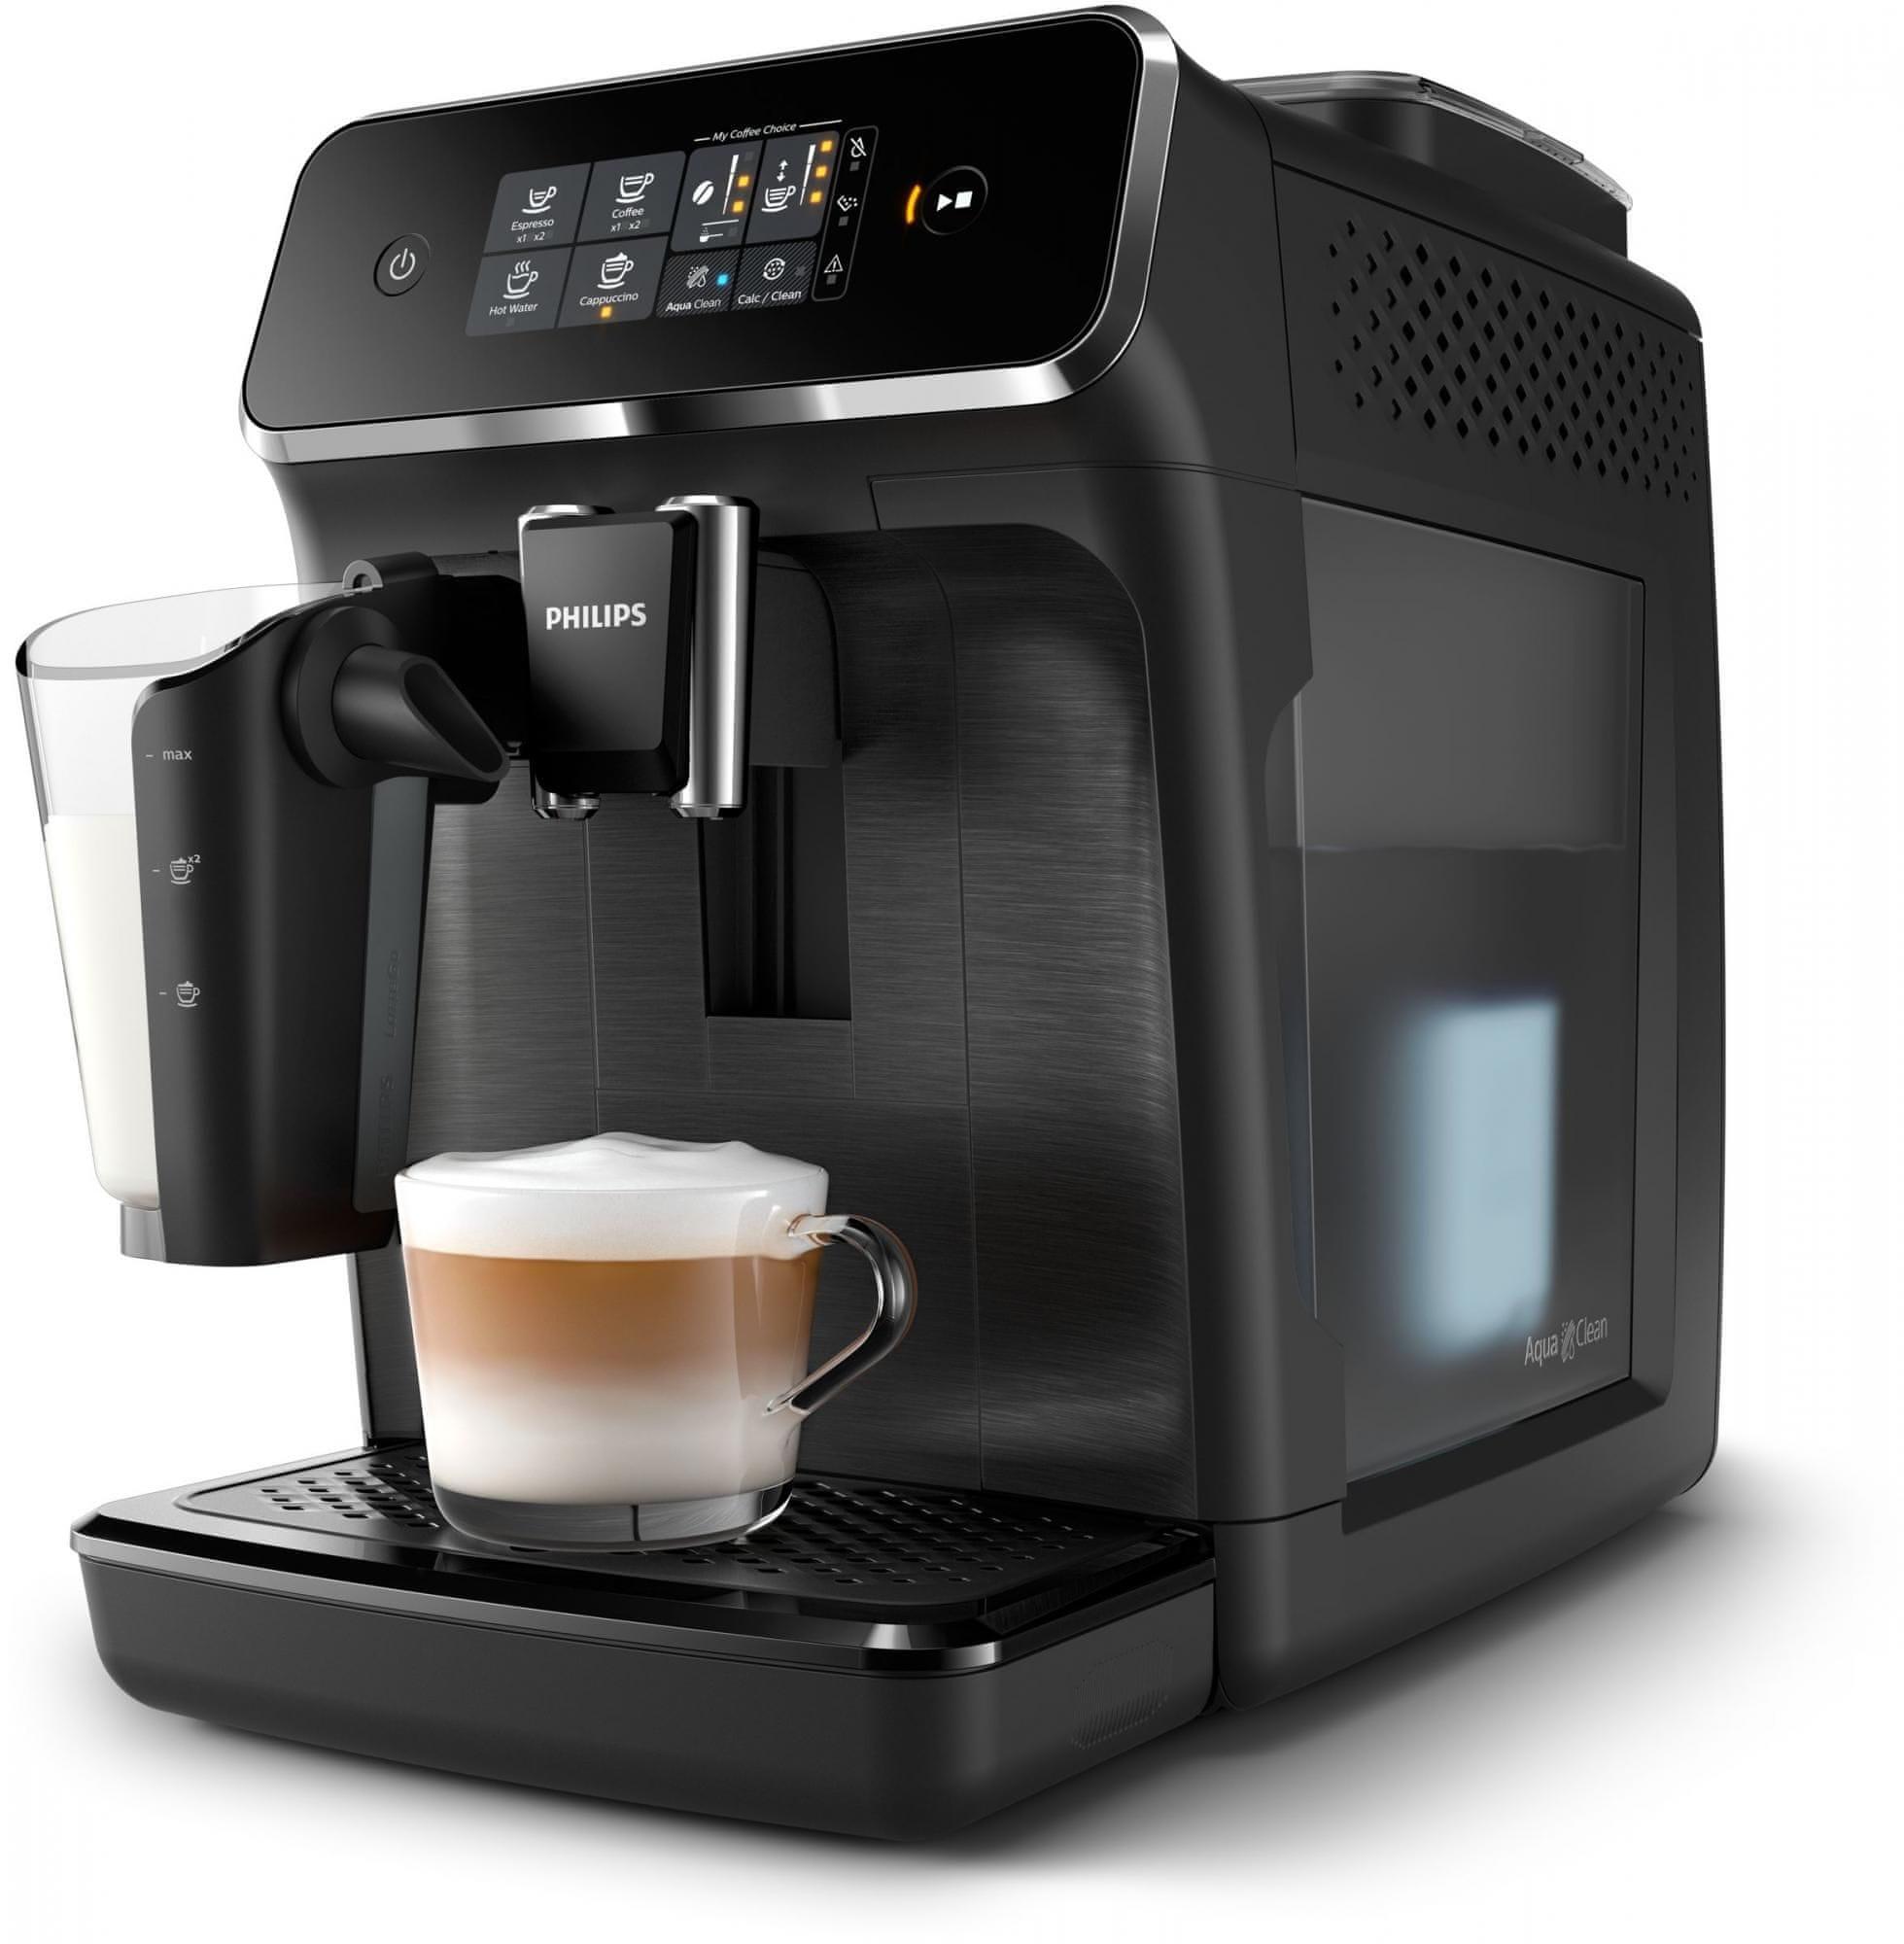 Kávovar Philips Series 2200 LatteGo EP2230/10